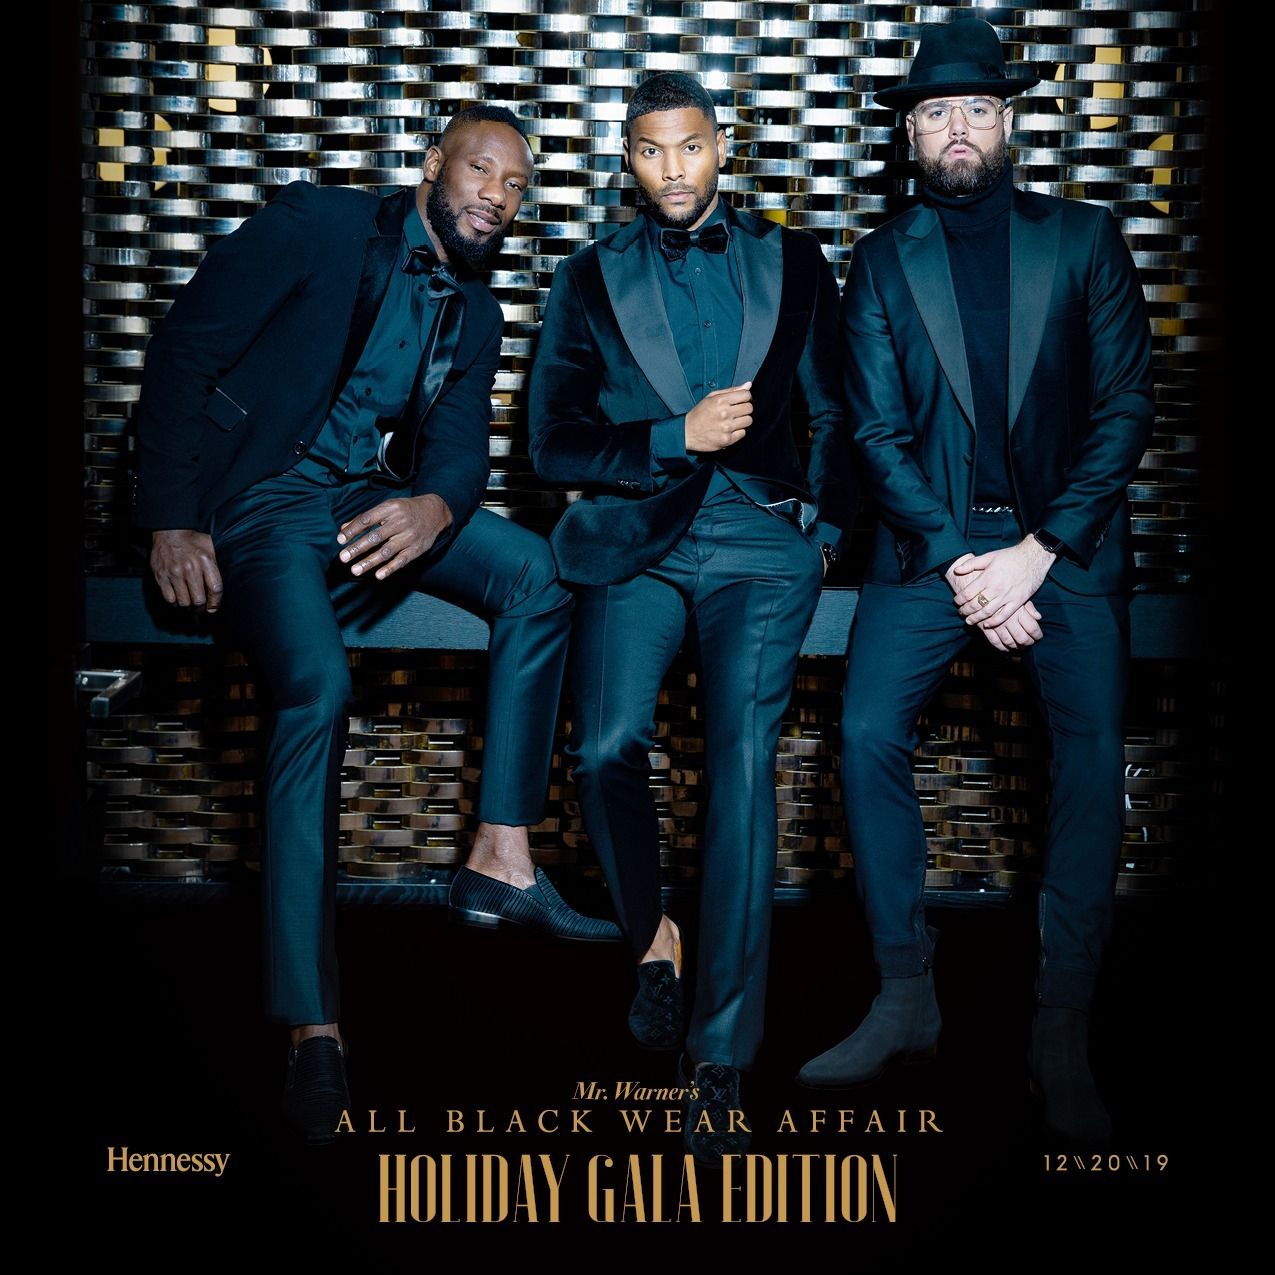 All Black Wear Affair 2019 - Holiday Gala Edition - Presented by Hennessy